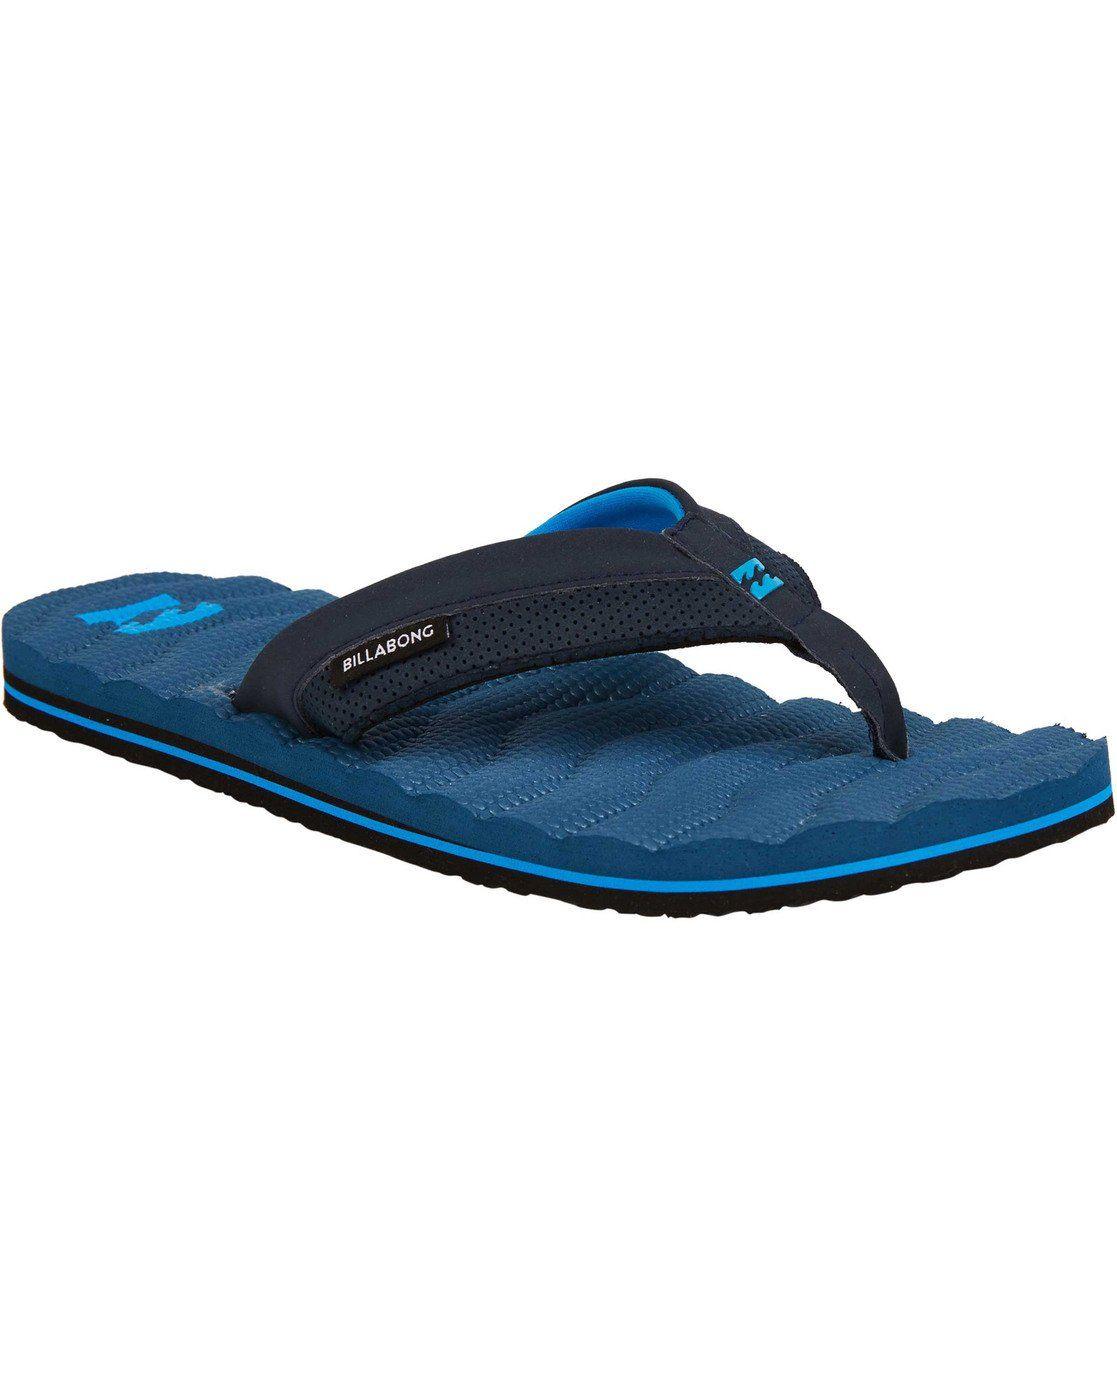 5725009a9fe Hurley Fusion Men s Sandal Size